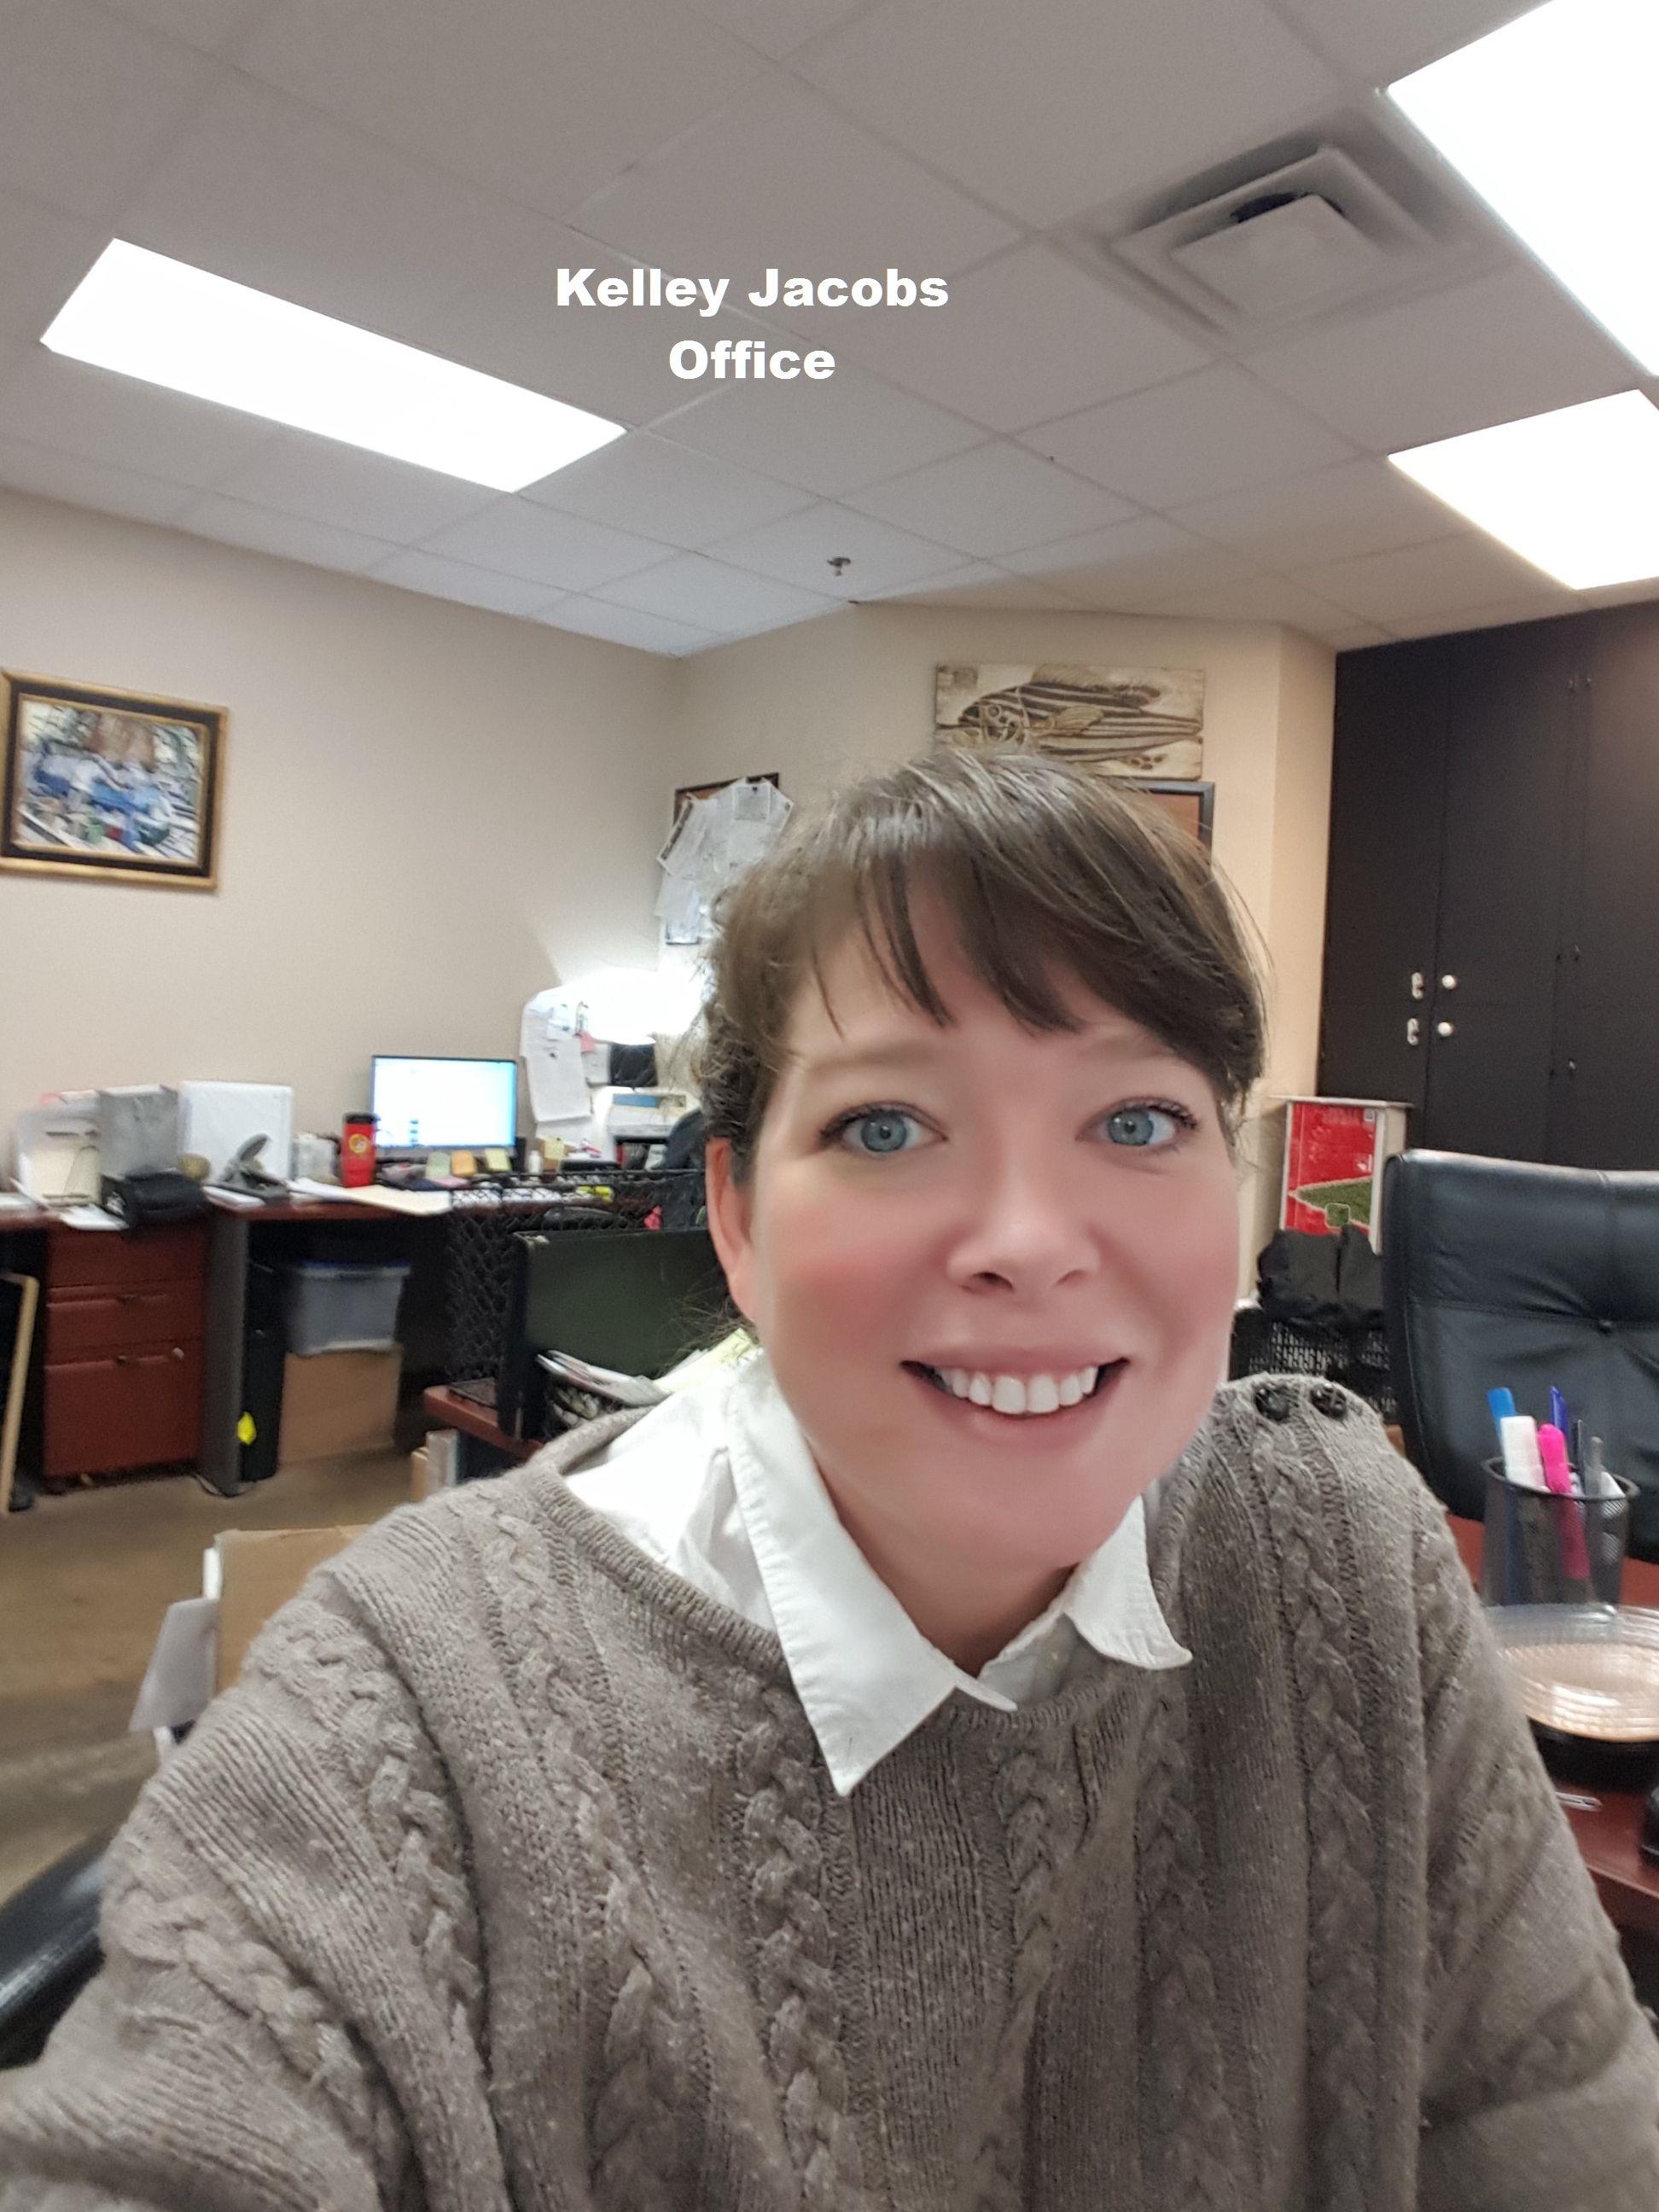 Kelley Jacobs - Office